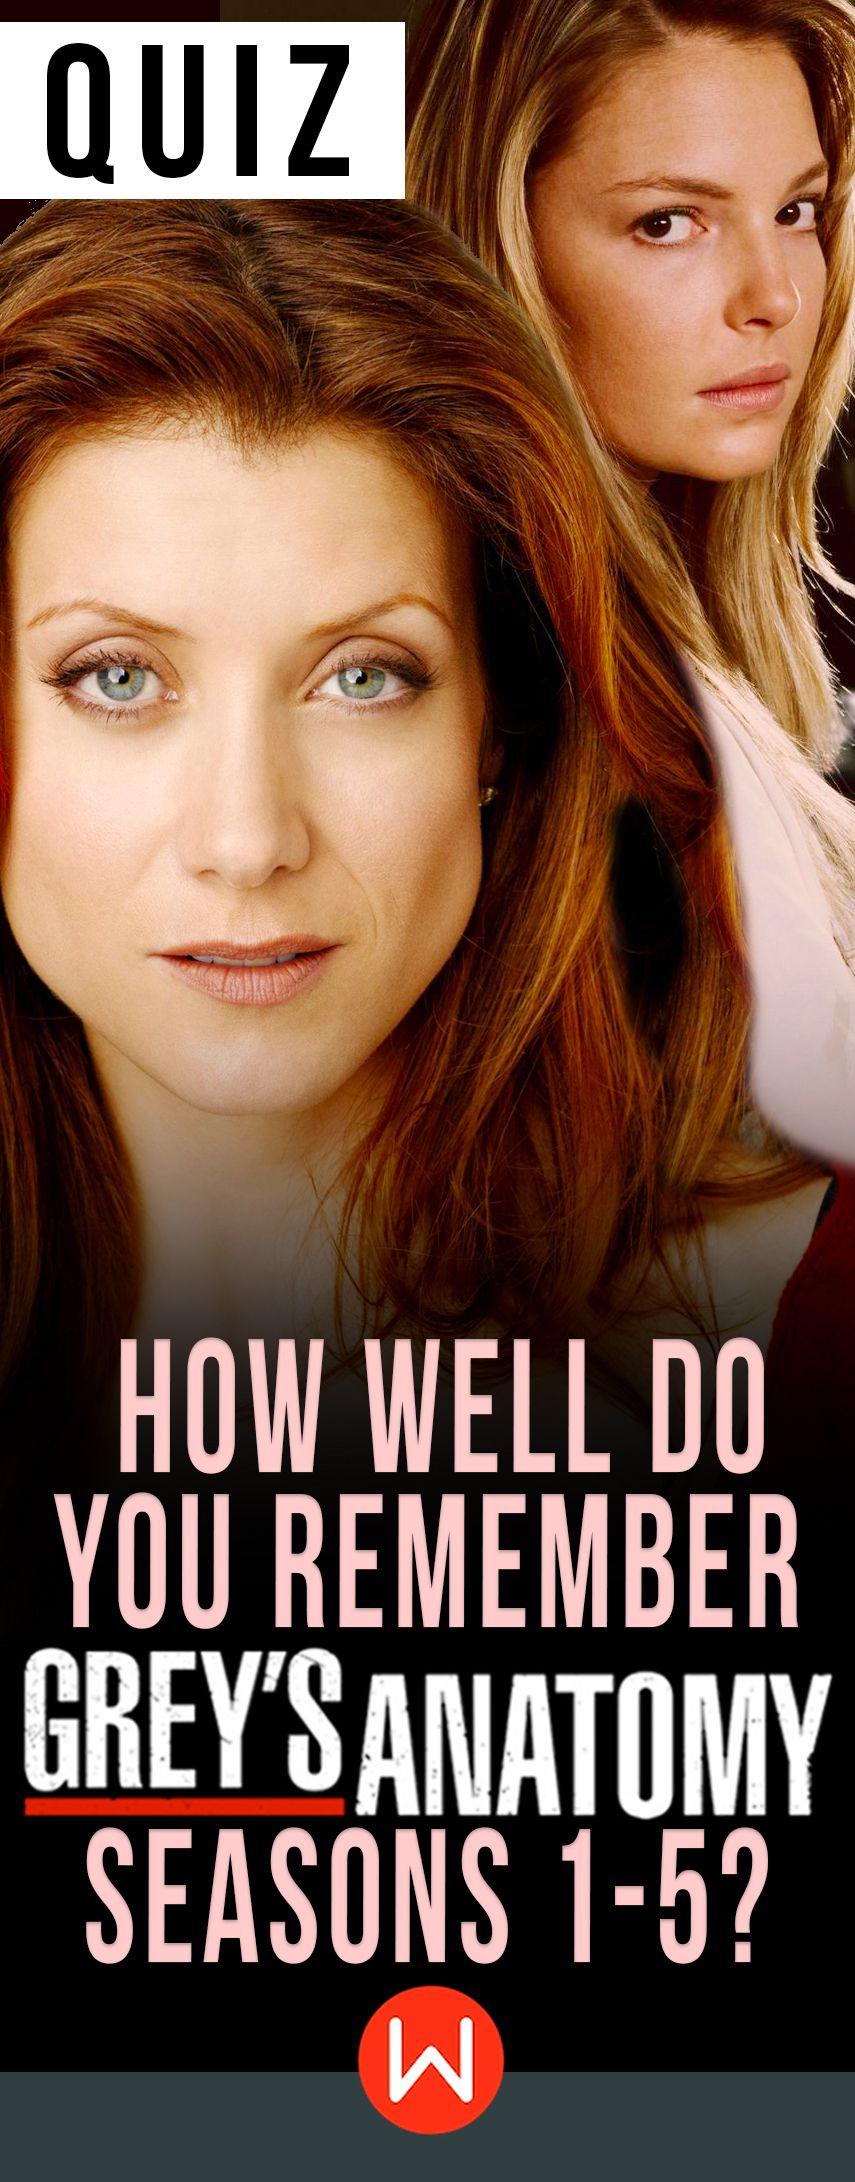 Quiz: How Well Do You Remember Grey\'s Anatomy Seasons 1-5? | Trivia ...